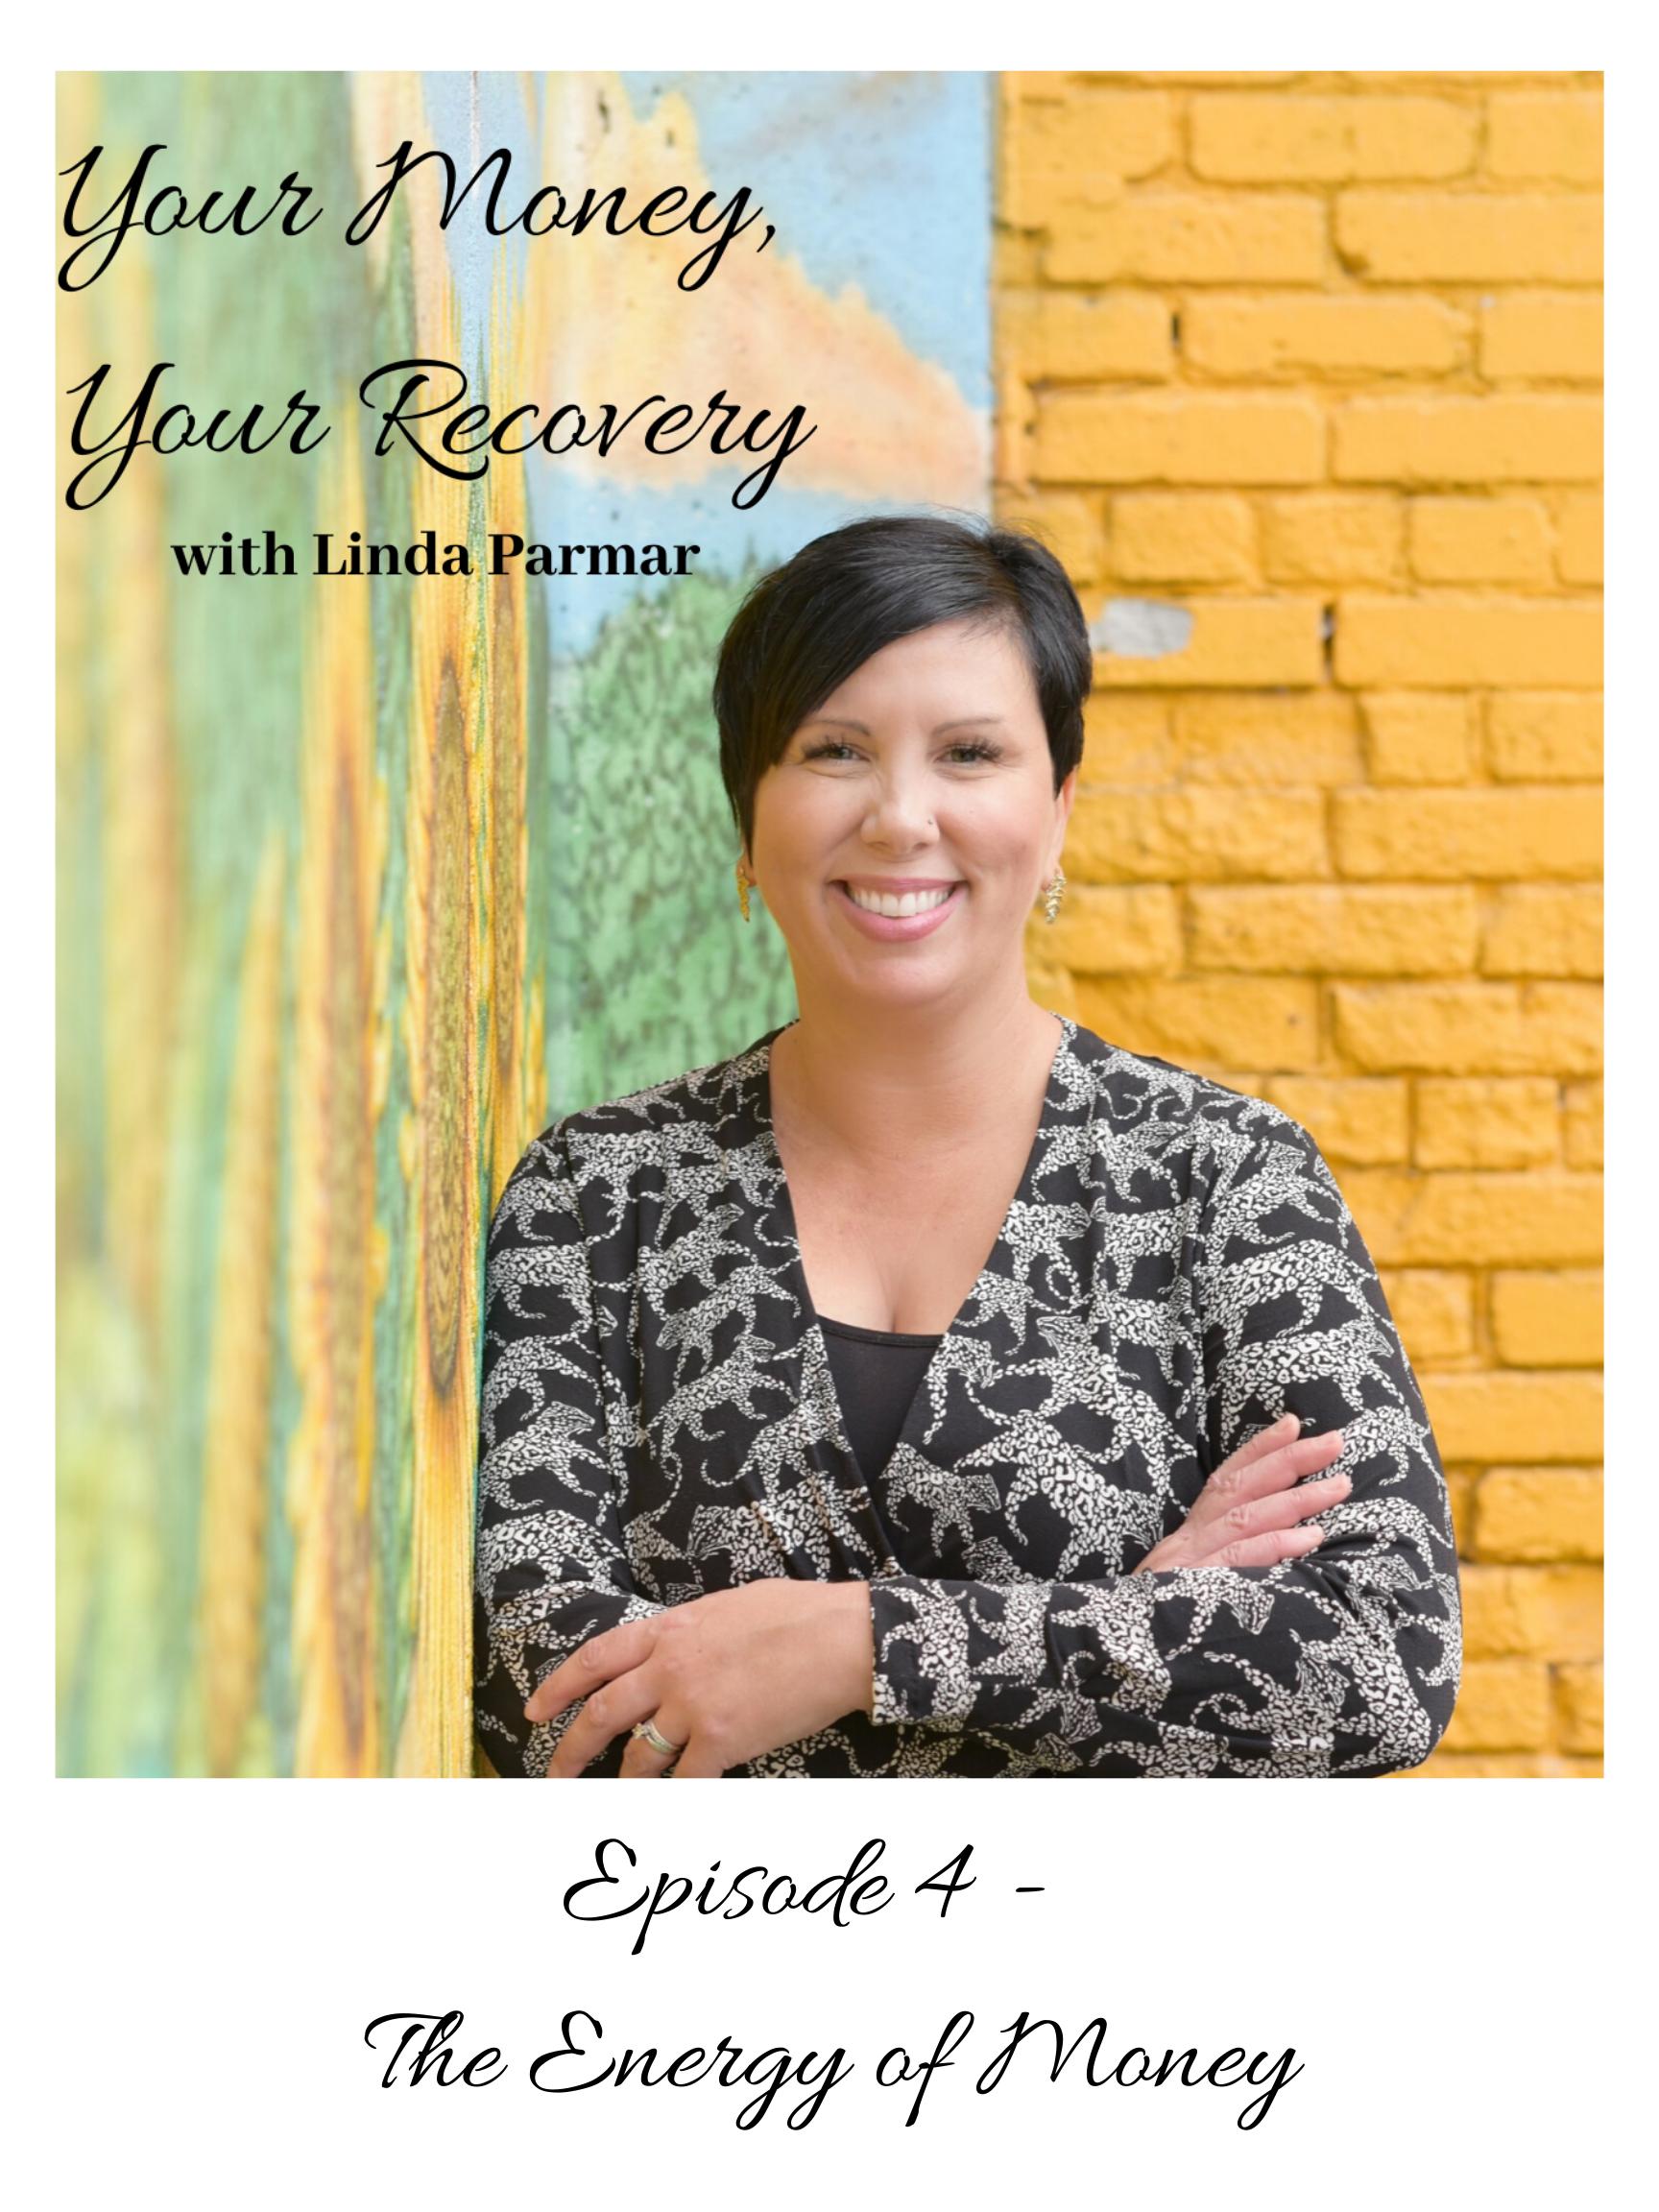 Episode 4 - The Energy of Money